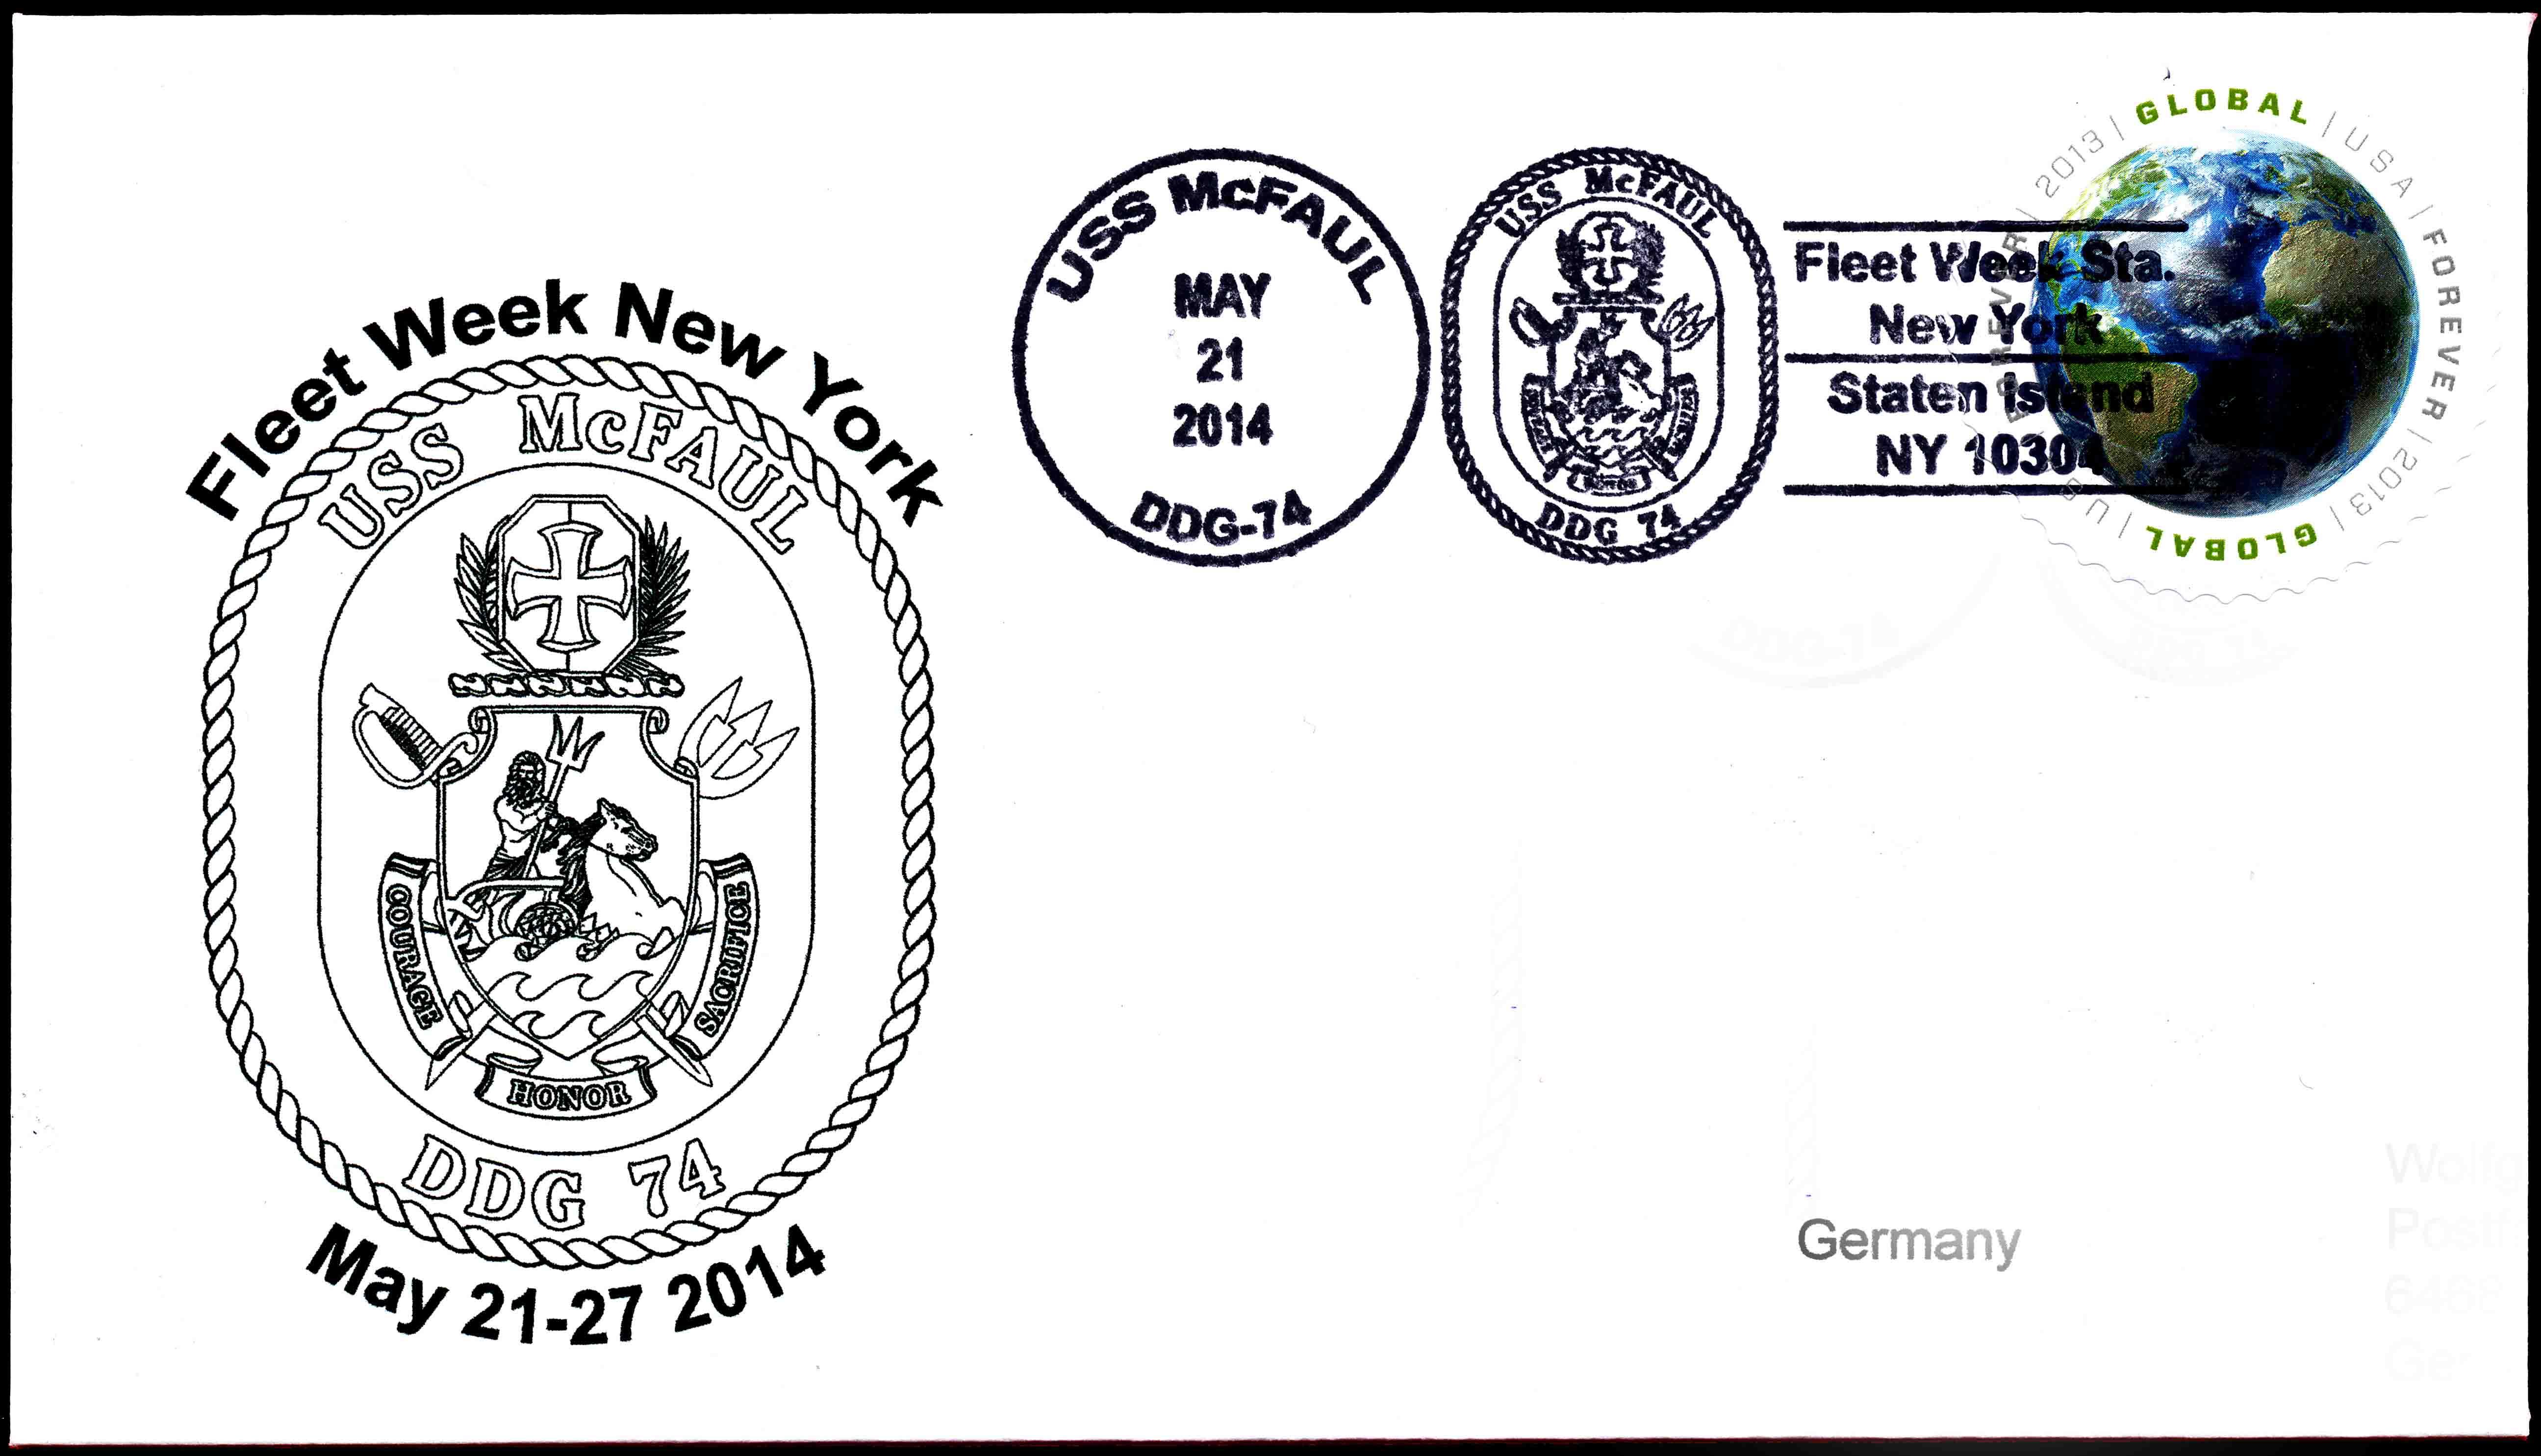 Beleg USS McFAUL Sonderpoststempel Fleet Week New York 2014 von Wolfgang Hechler